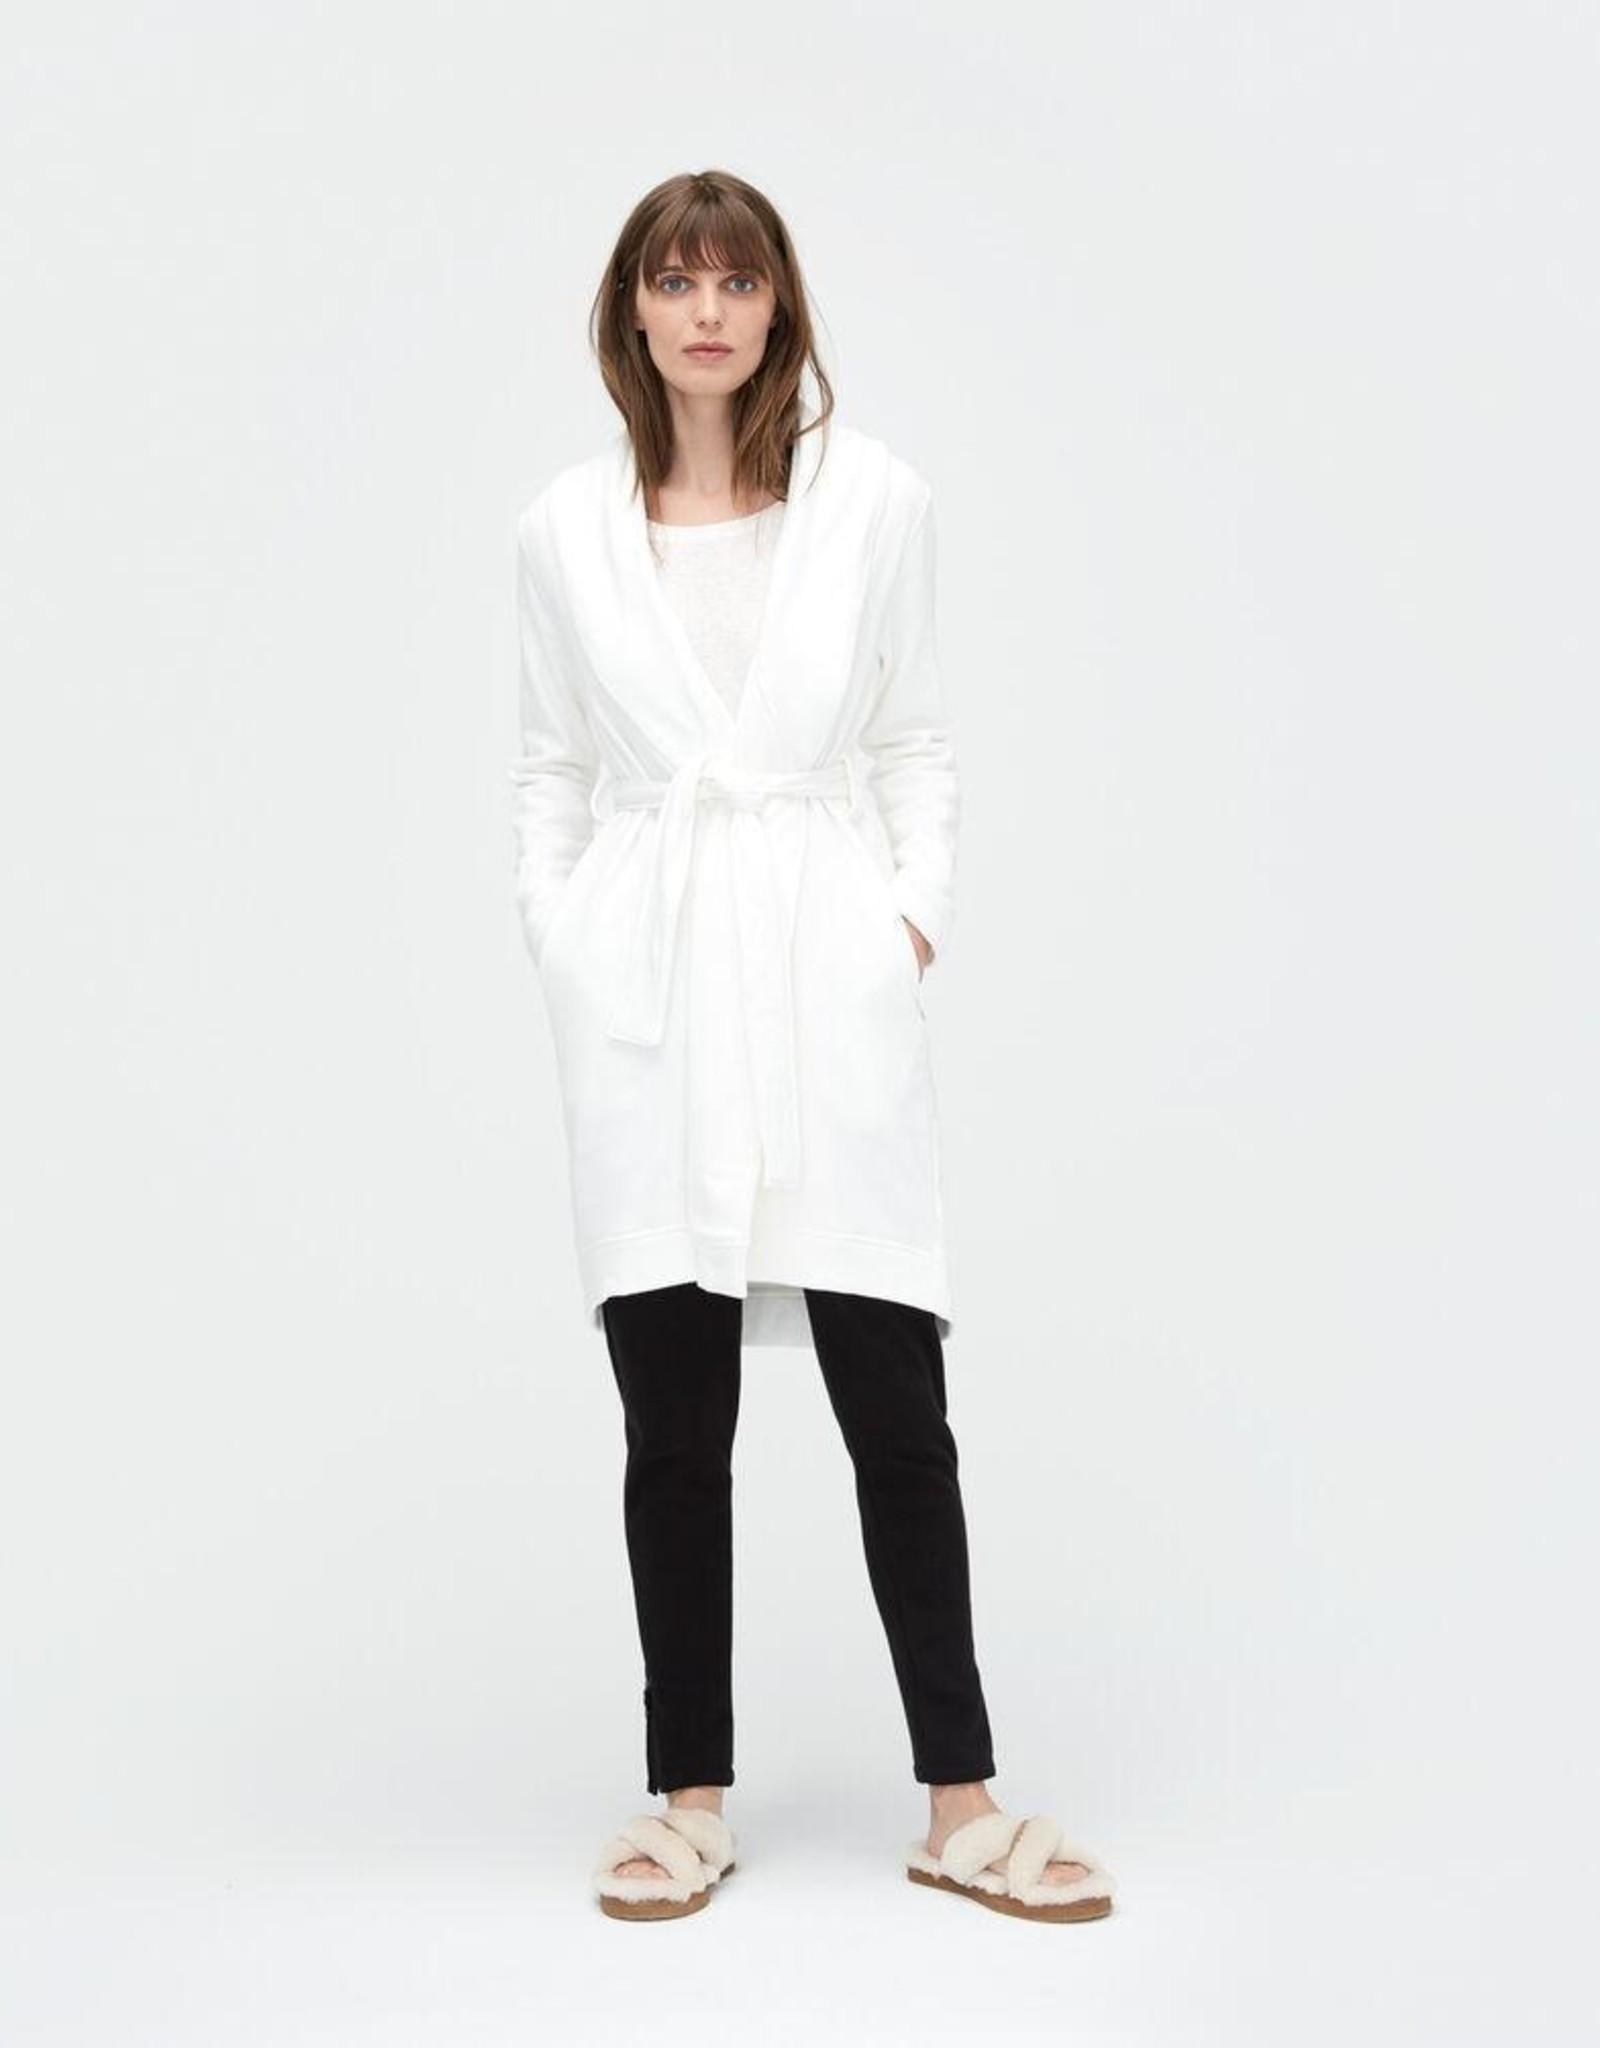 UGG - Woman's Blanche Cream Lightweight Robe